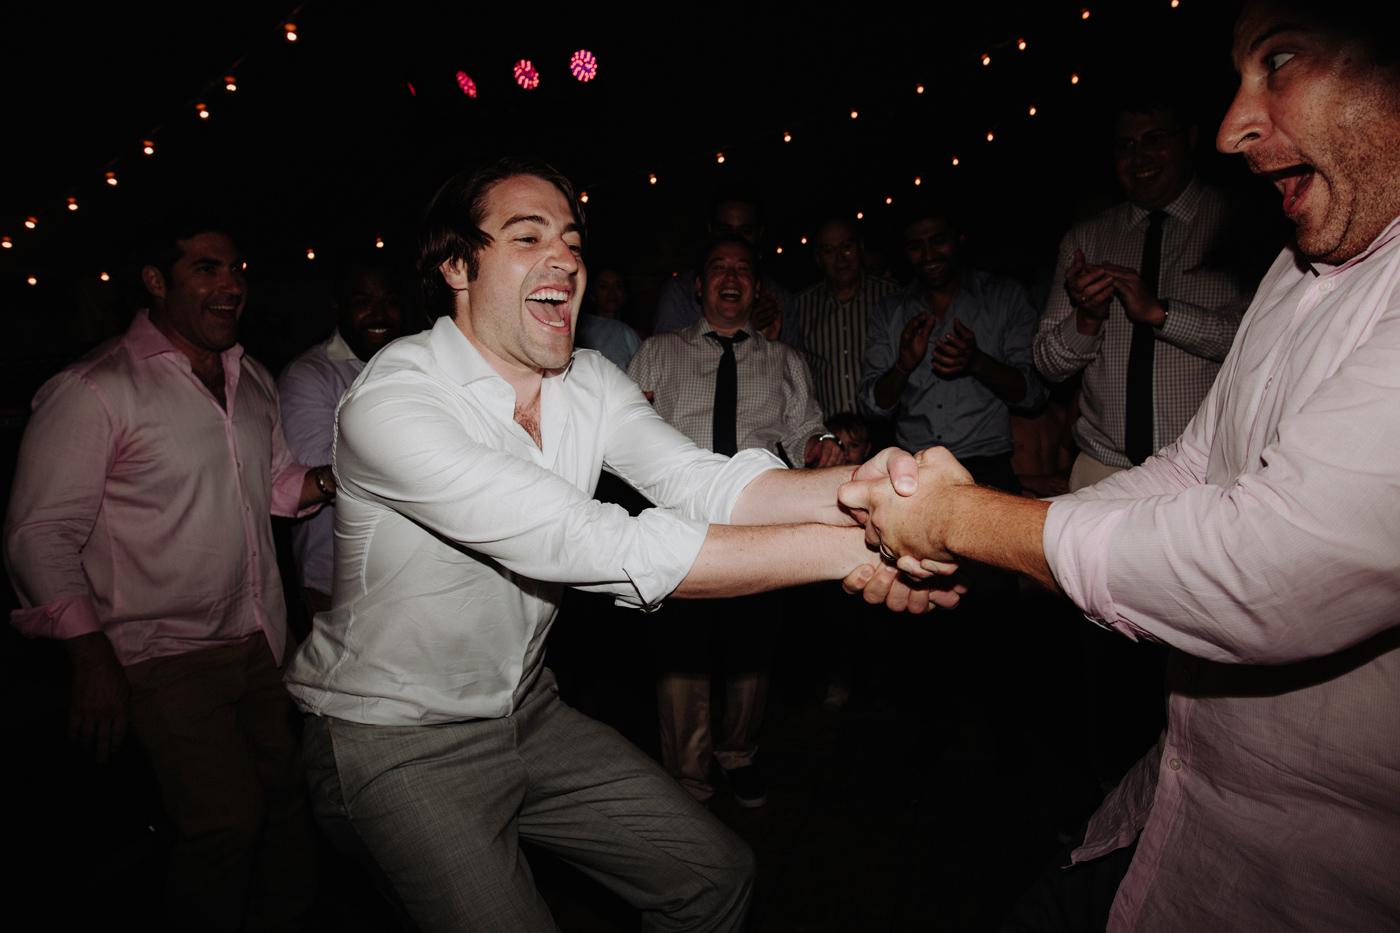 137-grand-teton-jackson-hole-wyoming-wedding.jpg